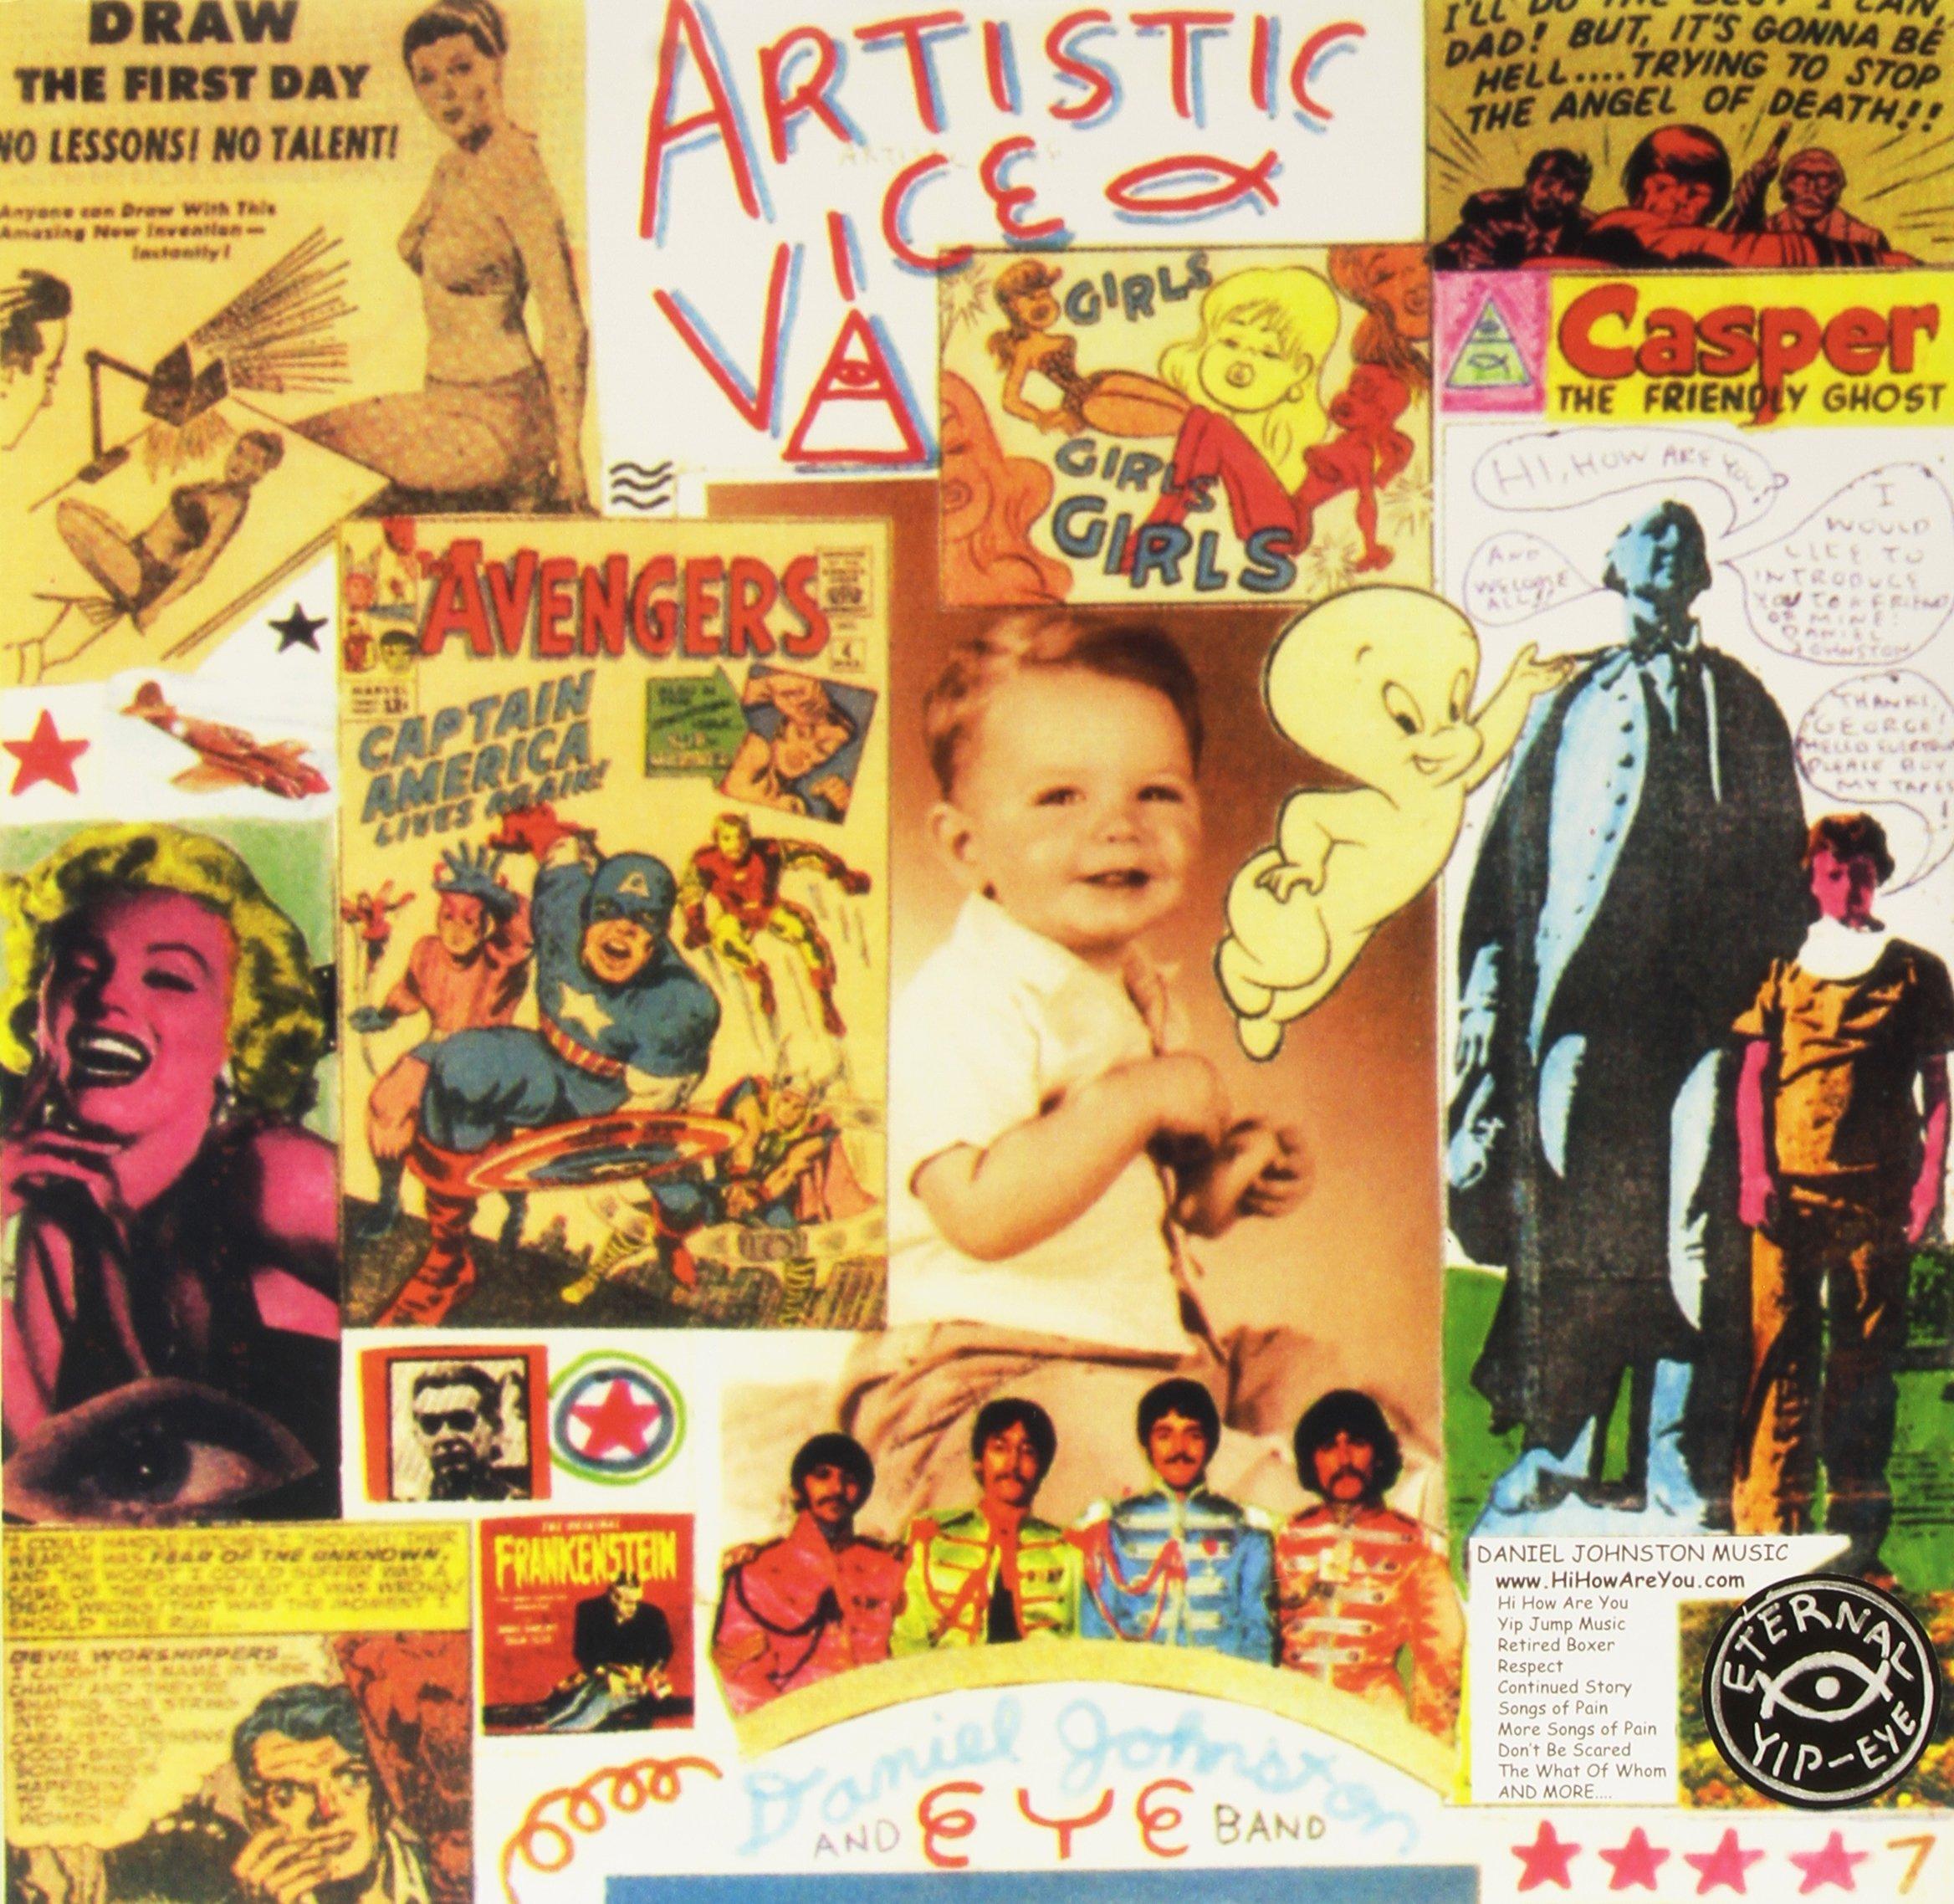 1990/Artistic Vice [Vinyl]